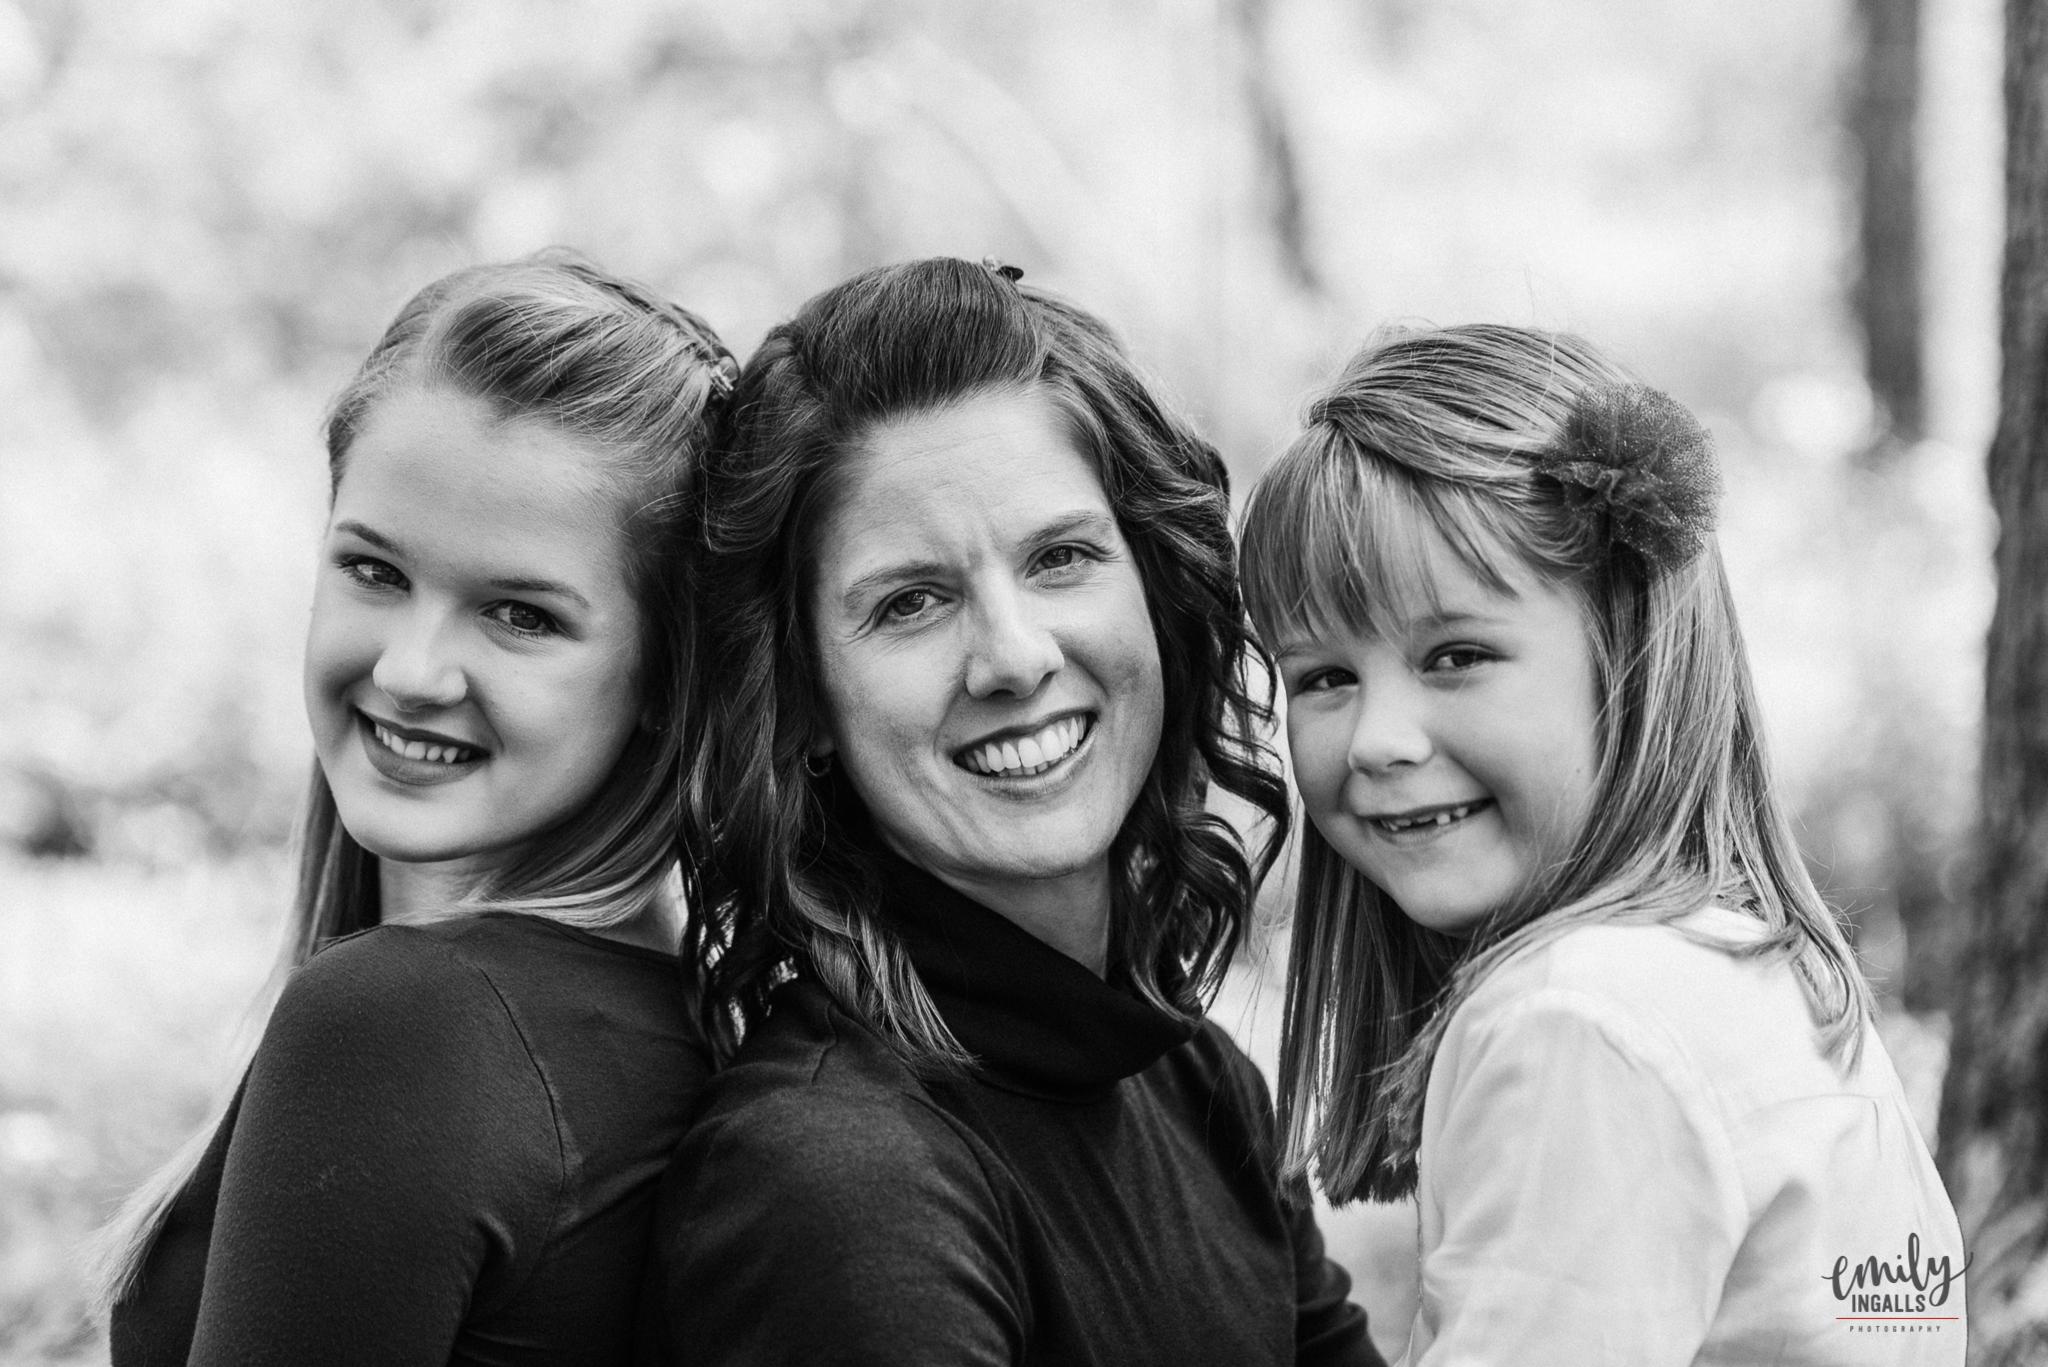 Family Photographer_Round Rock Photographer_Emily Ingalls Photography_Austin Photographer_Pflugerville Family Photographer-21.jpg